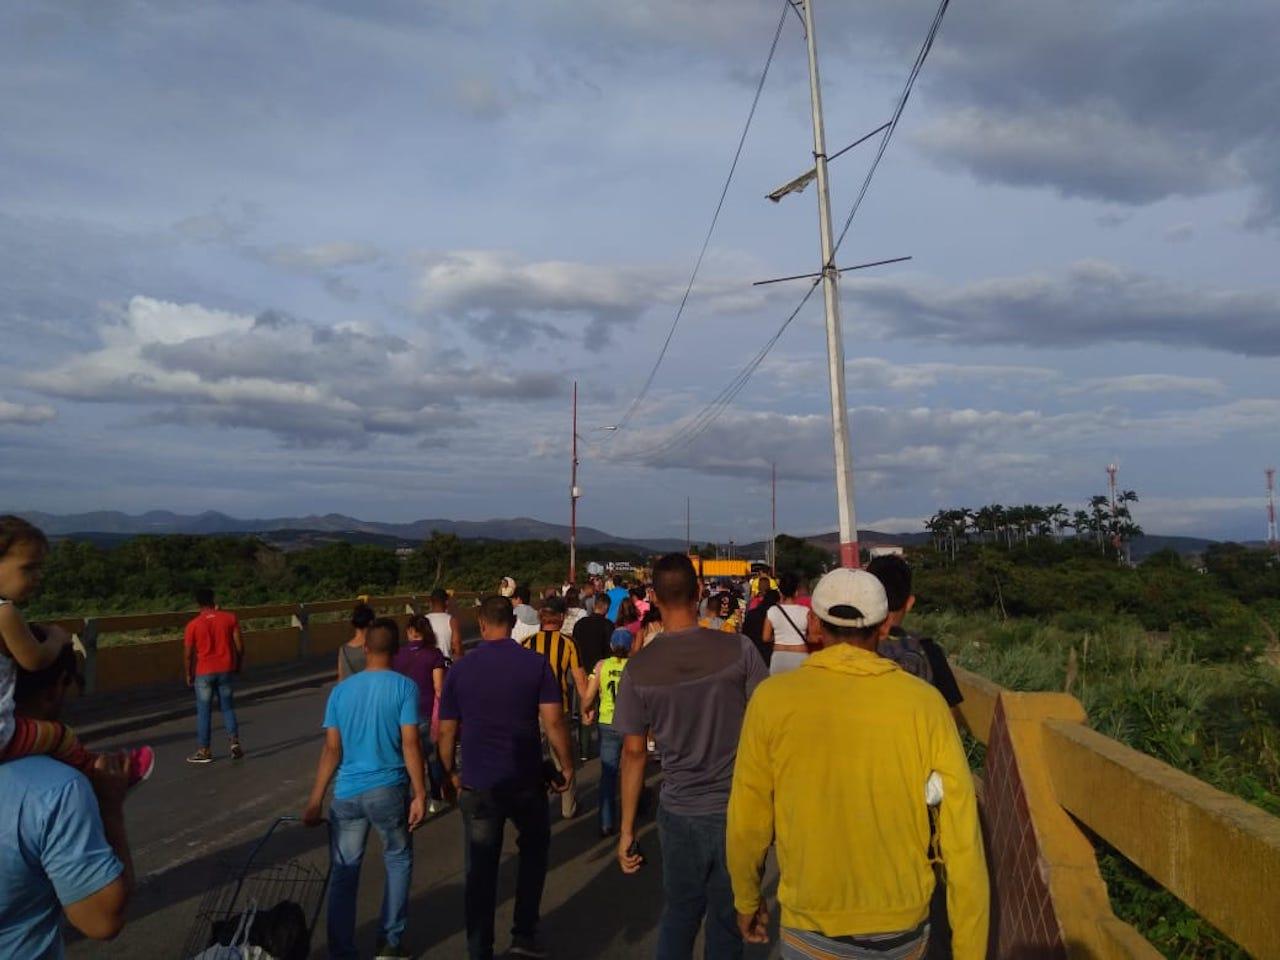 200 mil personas cruzaron frontera colombo-venezolana en tres días